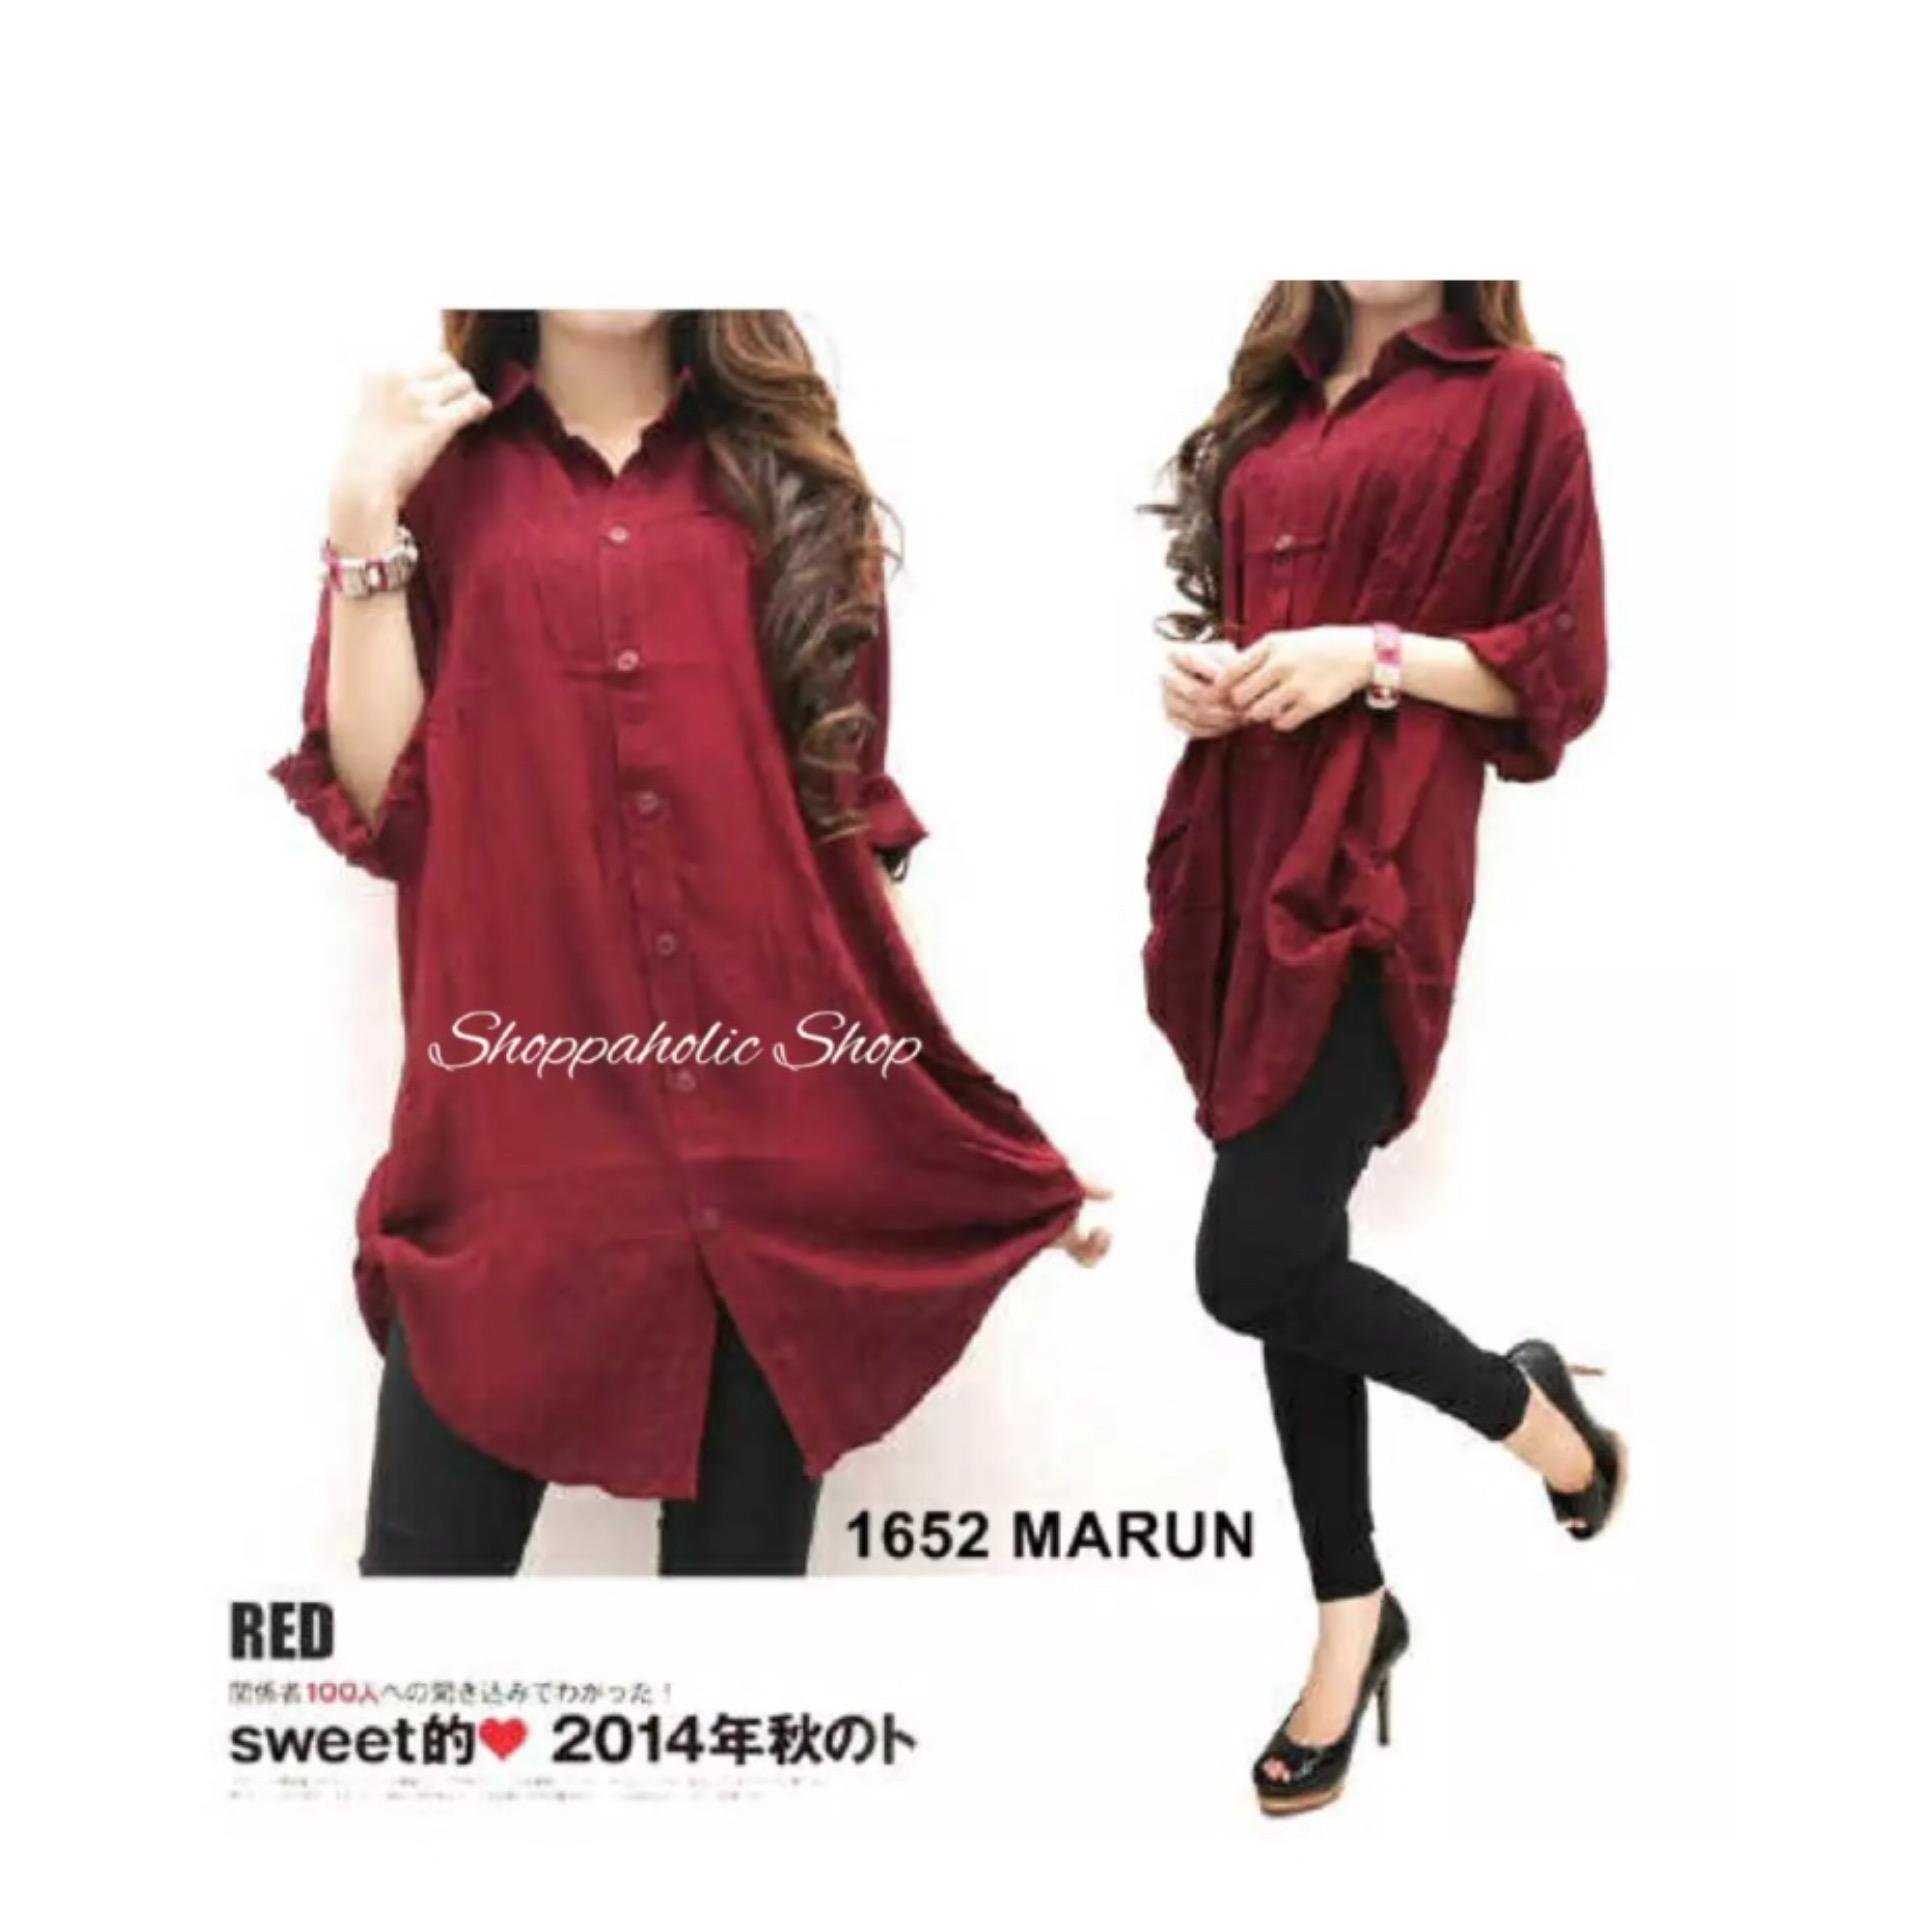 GA Fashion Kemeja Jumbo Polos Maroon Baju Wanita / Blouse Korea / Atasan Wanita / Baju Formal / Kemeja Wanita / Kemeja Formal / Atasan Muslim / Kemeja Cewek Tunik / Blouse Sabrina / Dress Muslim / Dress Cantik